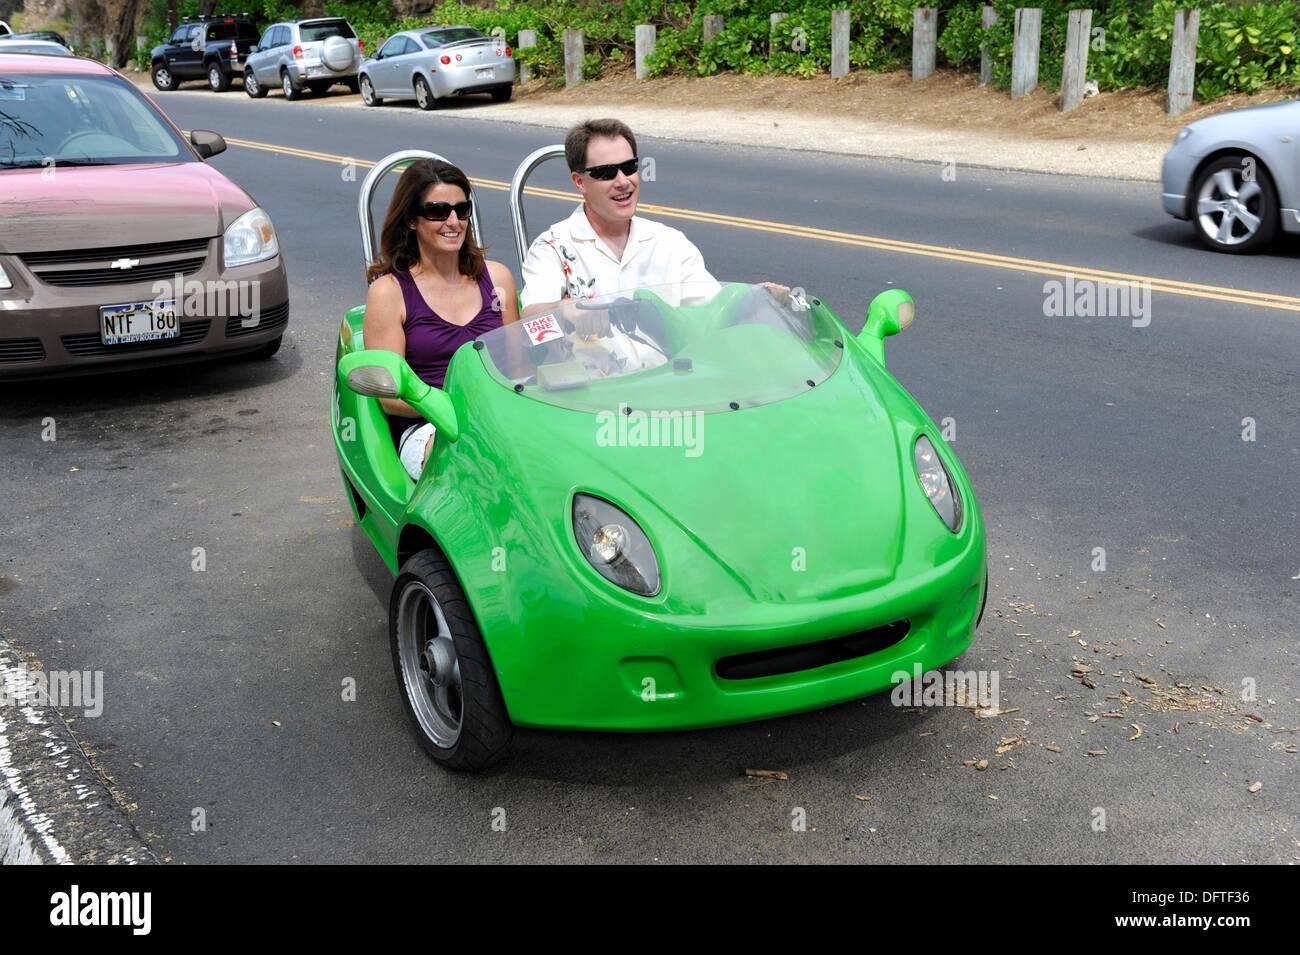 a62af7e42485de Couple in mini rental car visit honolulu hawaii oahu pacific ocean - Stock  Image